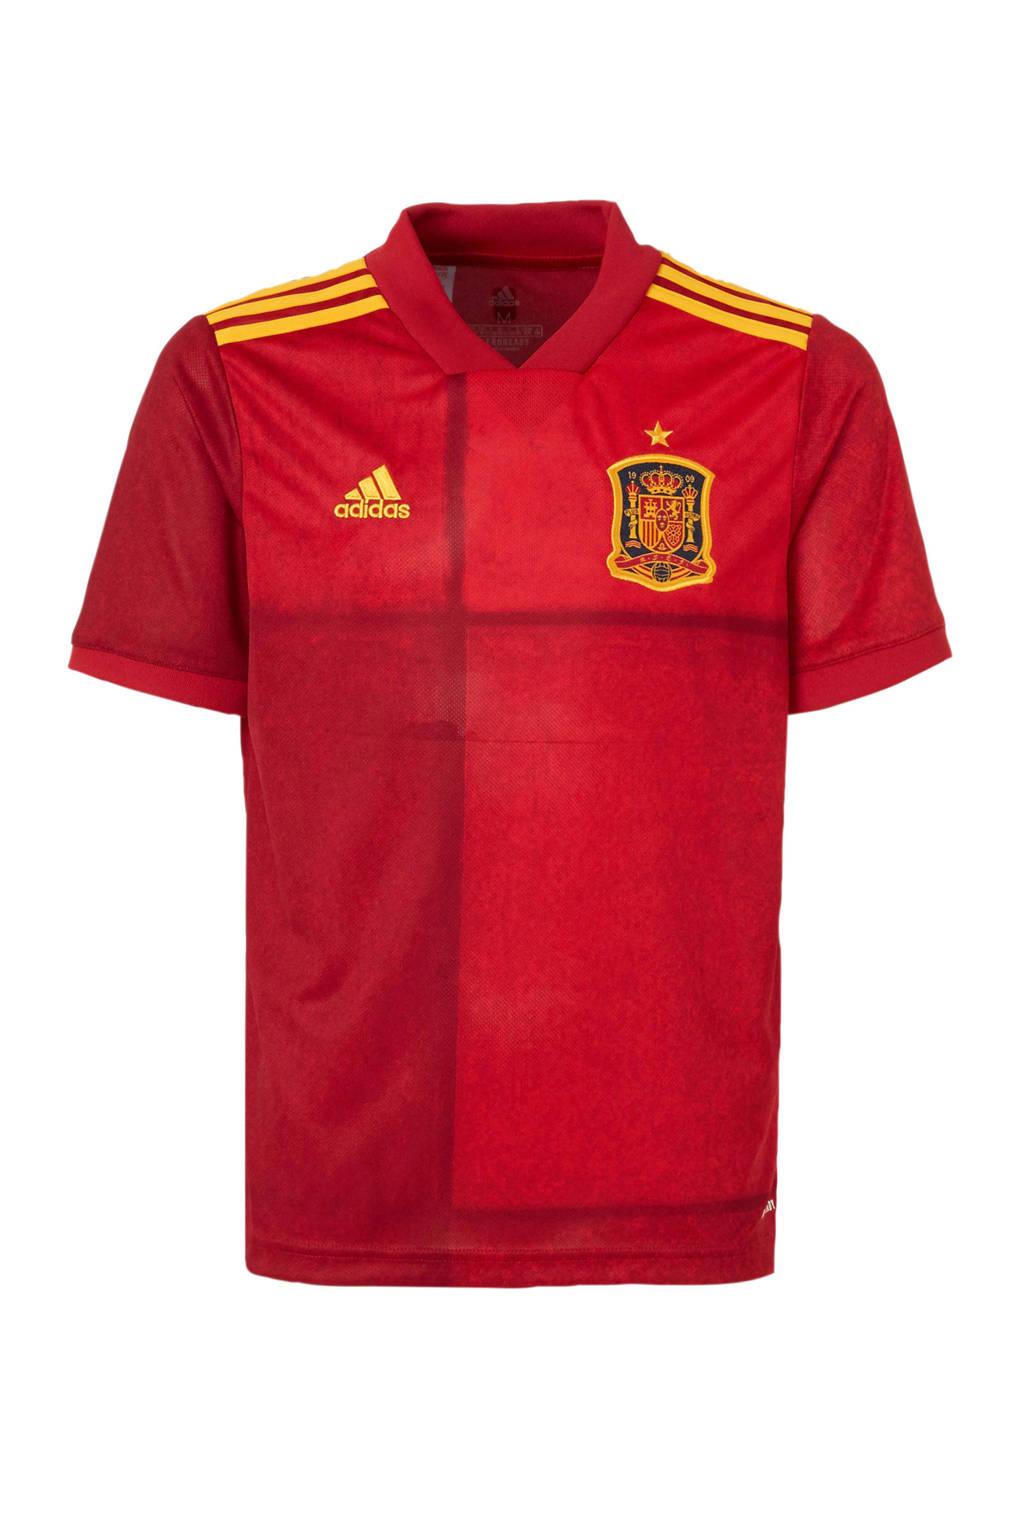 adidas Junior Spanje voetbalshirt rood, Jongens/meisjes